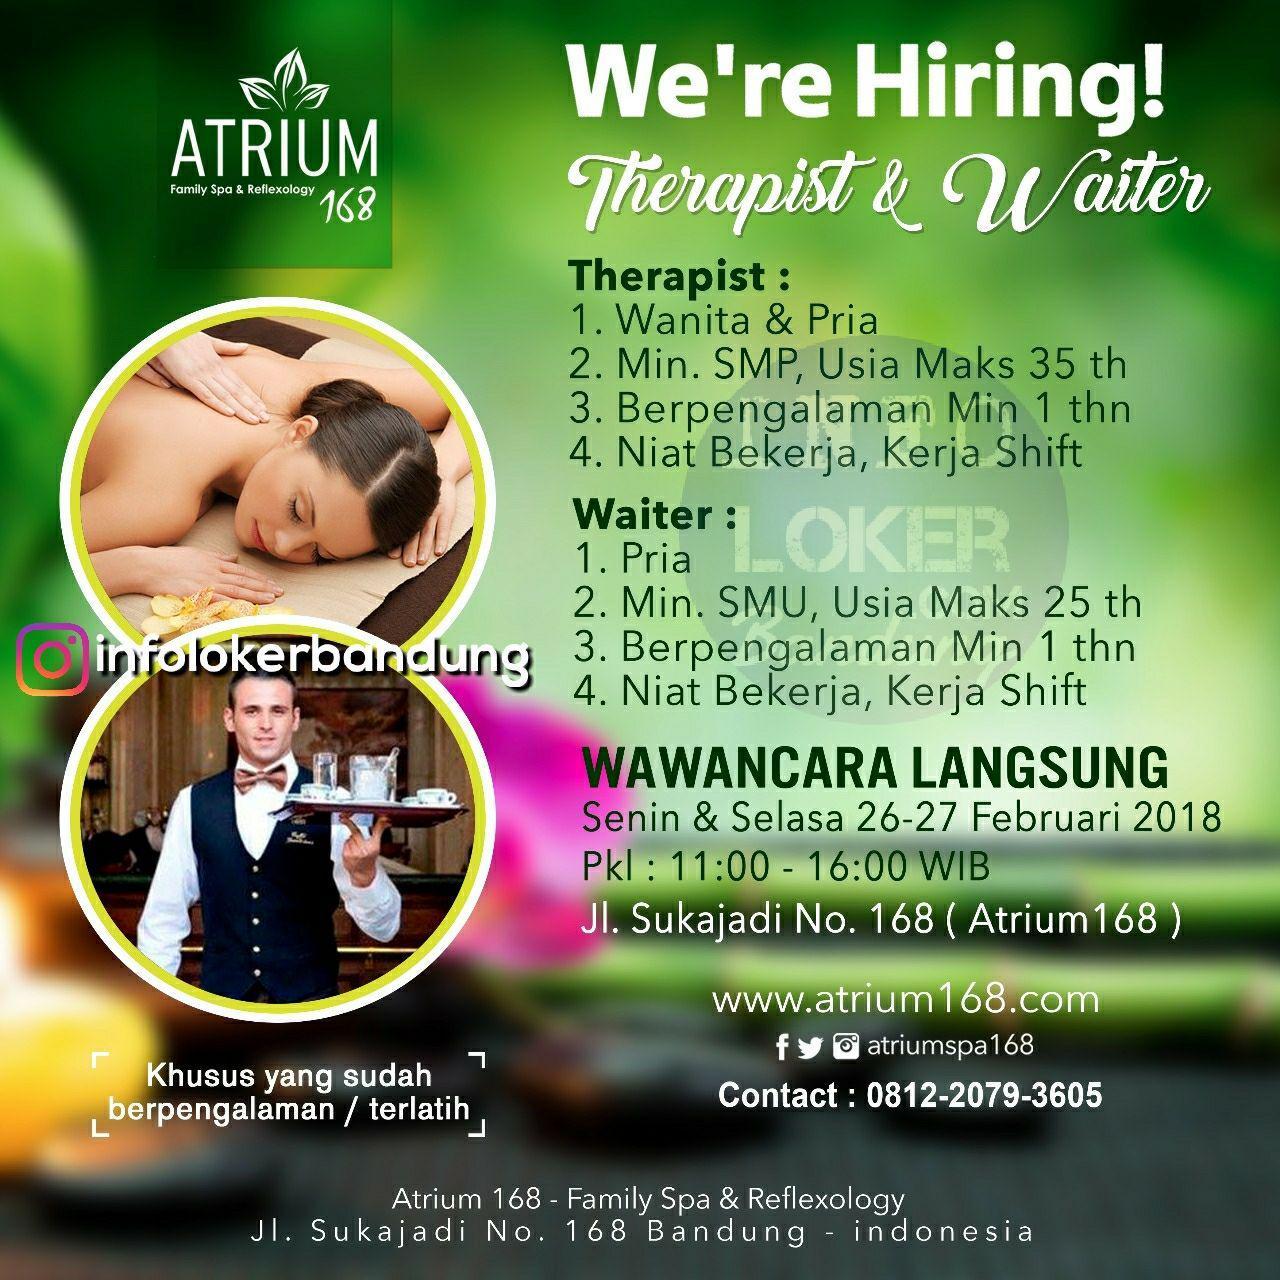 Walk In Interview Atrium 168 Bandung 26 -27 Februari 2018